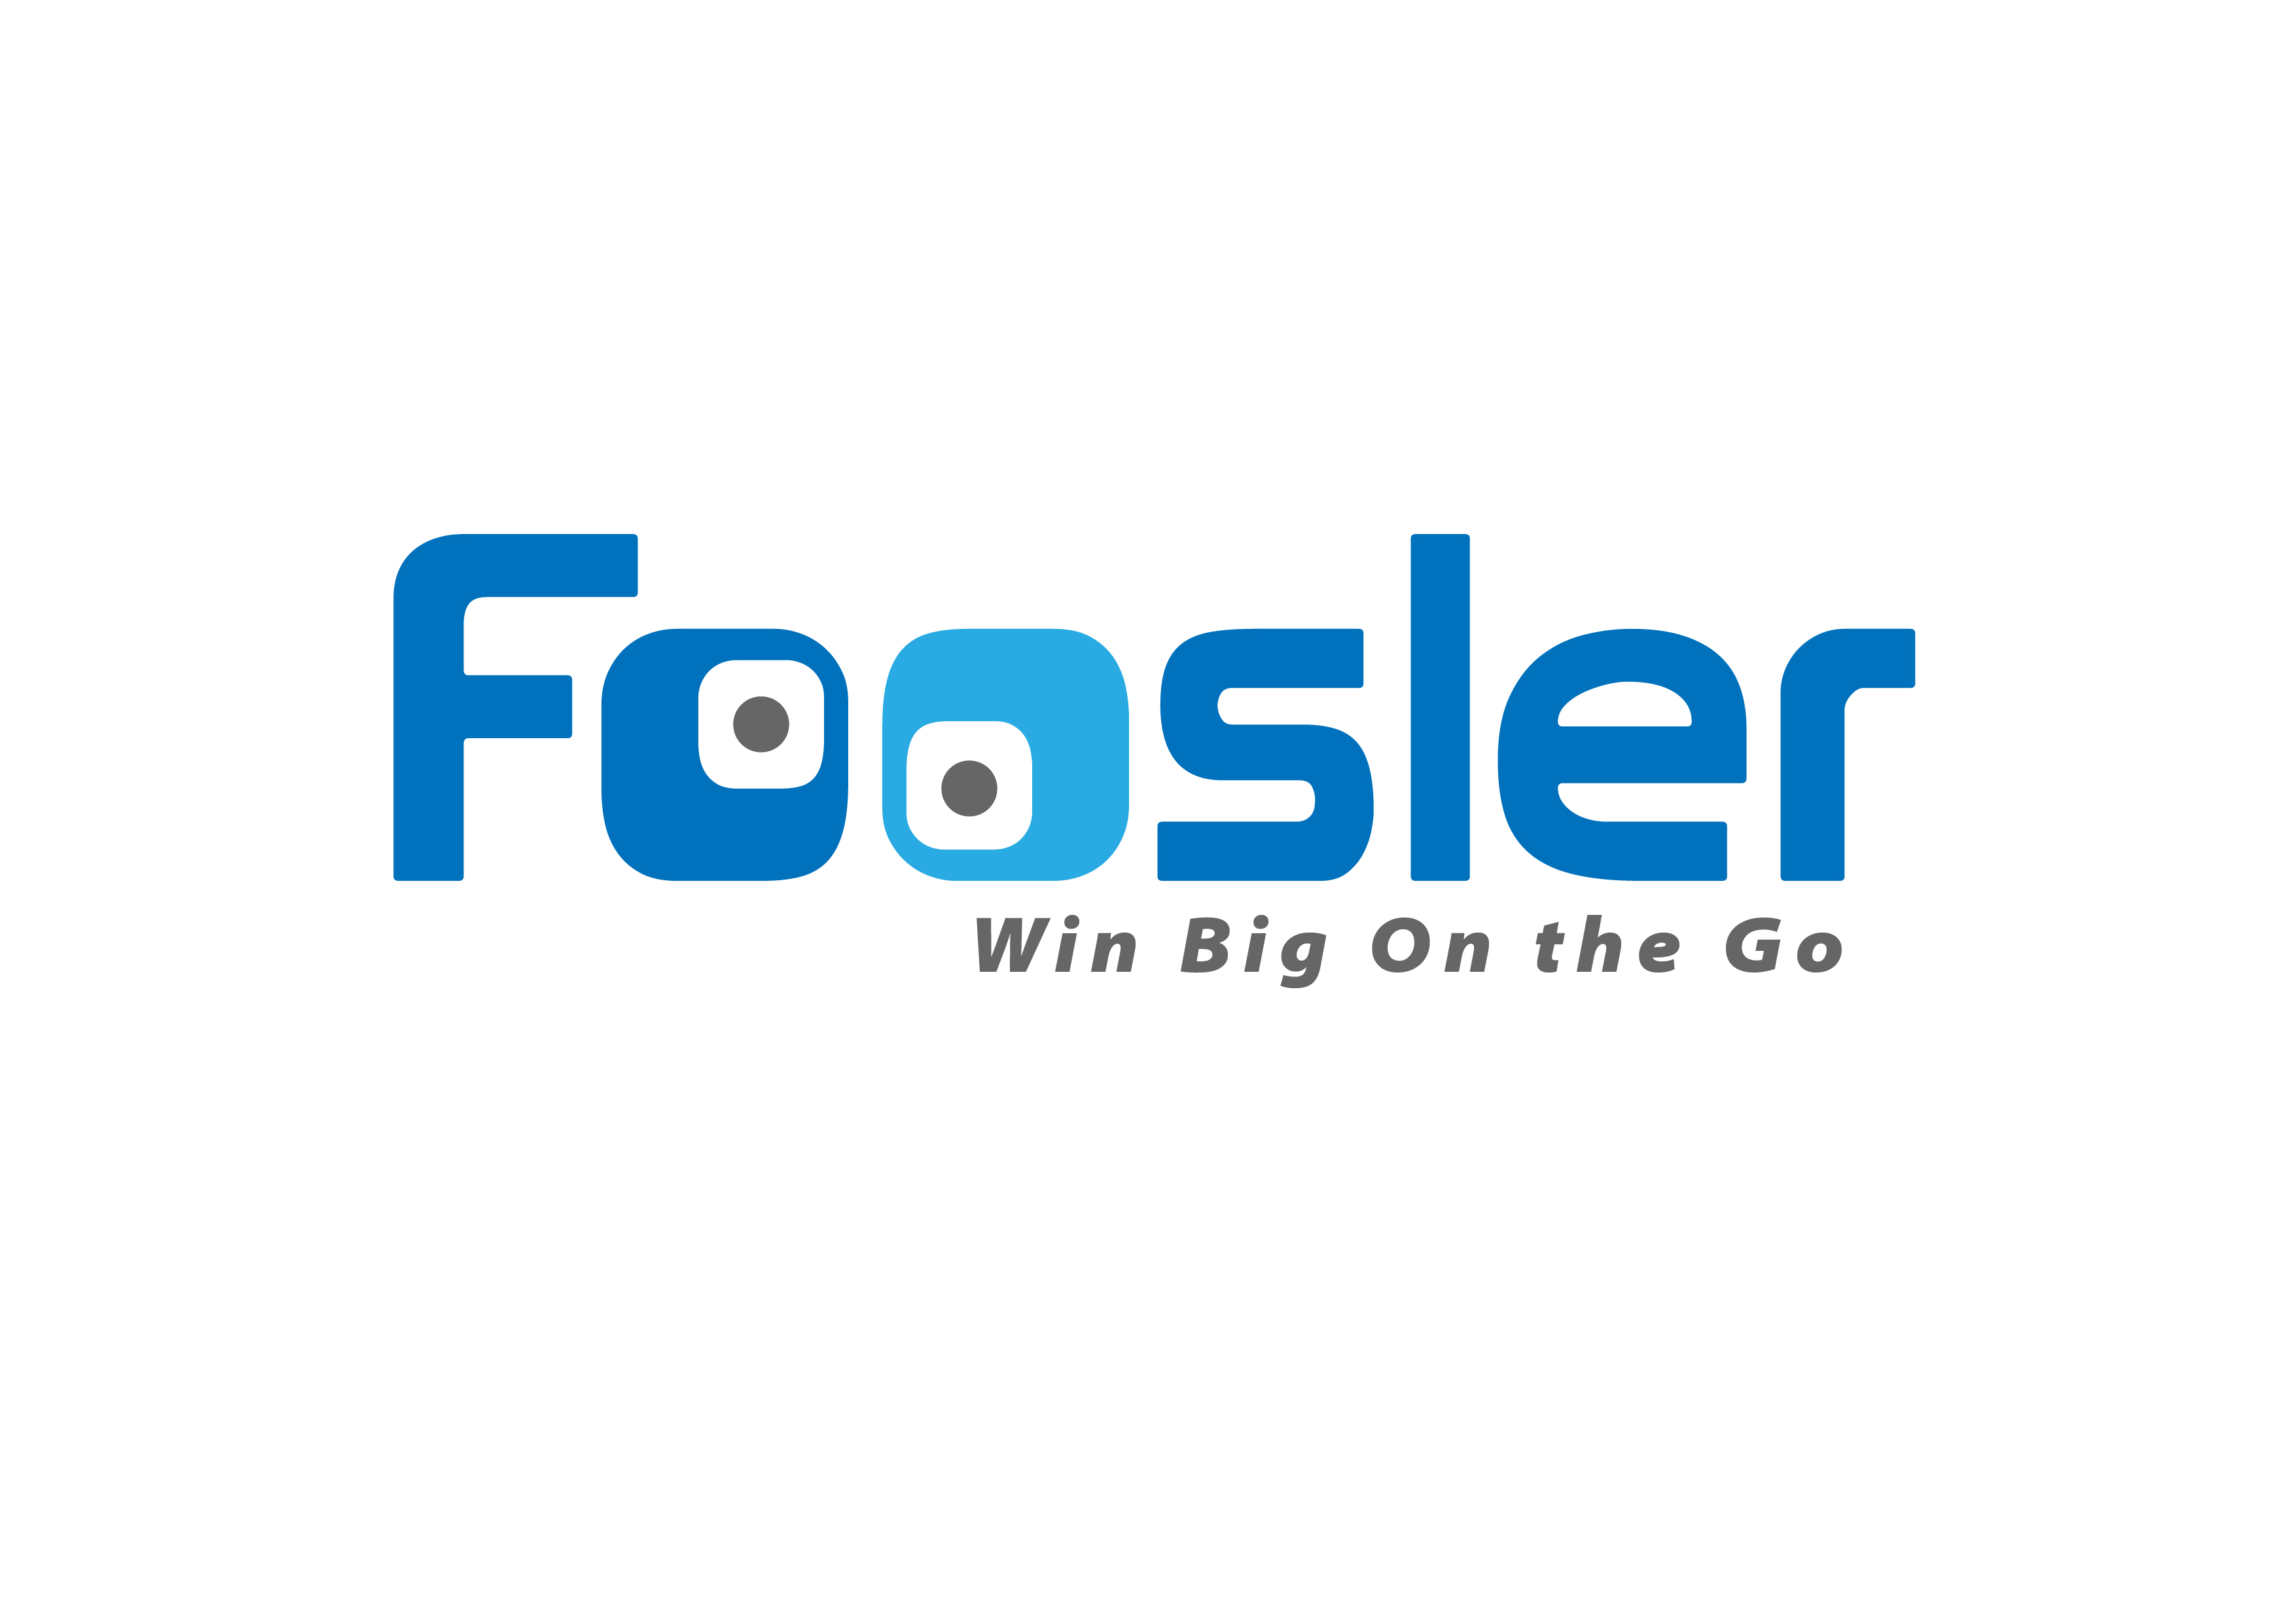 Logo Design by 3draw - Entry No. 121 in the Logo Design Contest Foosler Logo Design.